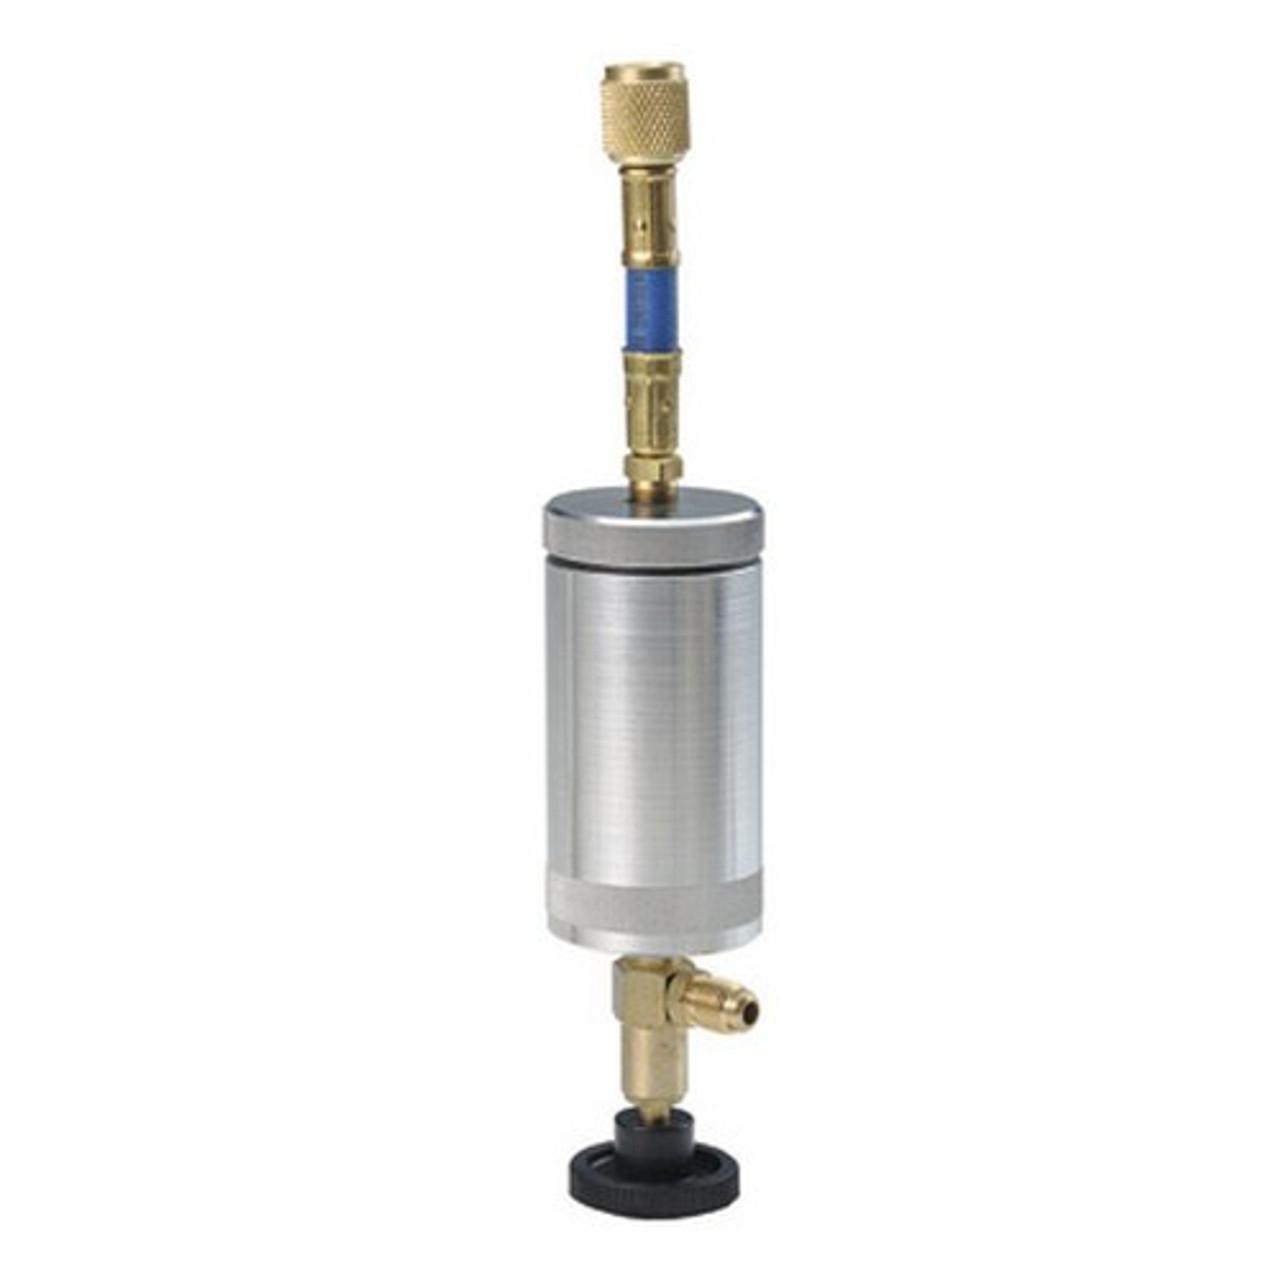 2738 Inc R134a Flow Through Oil Injector FJC